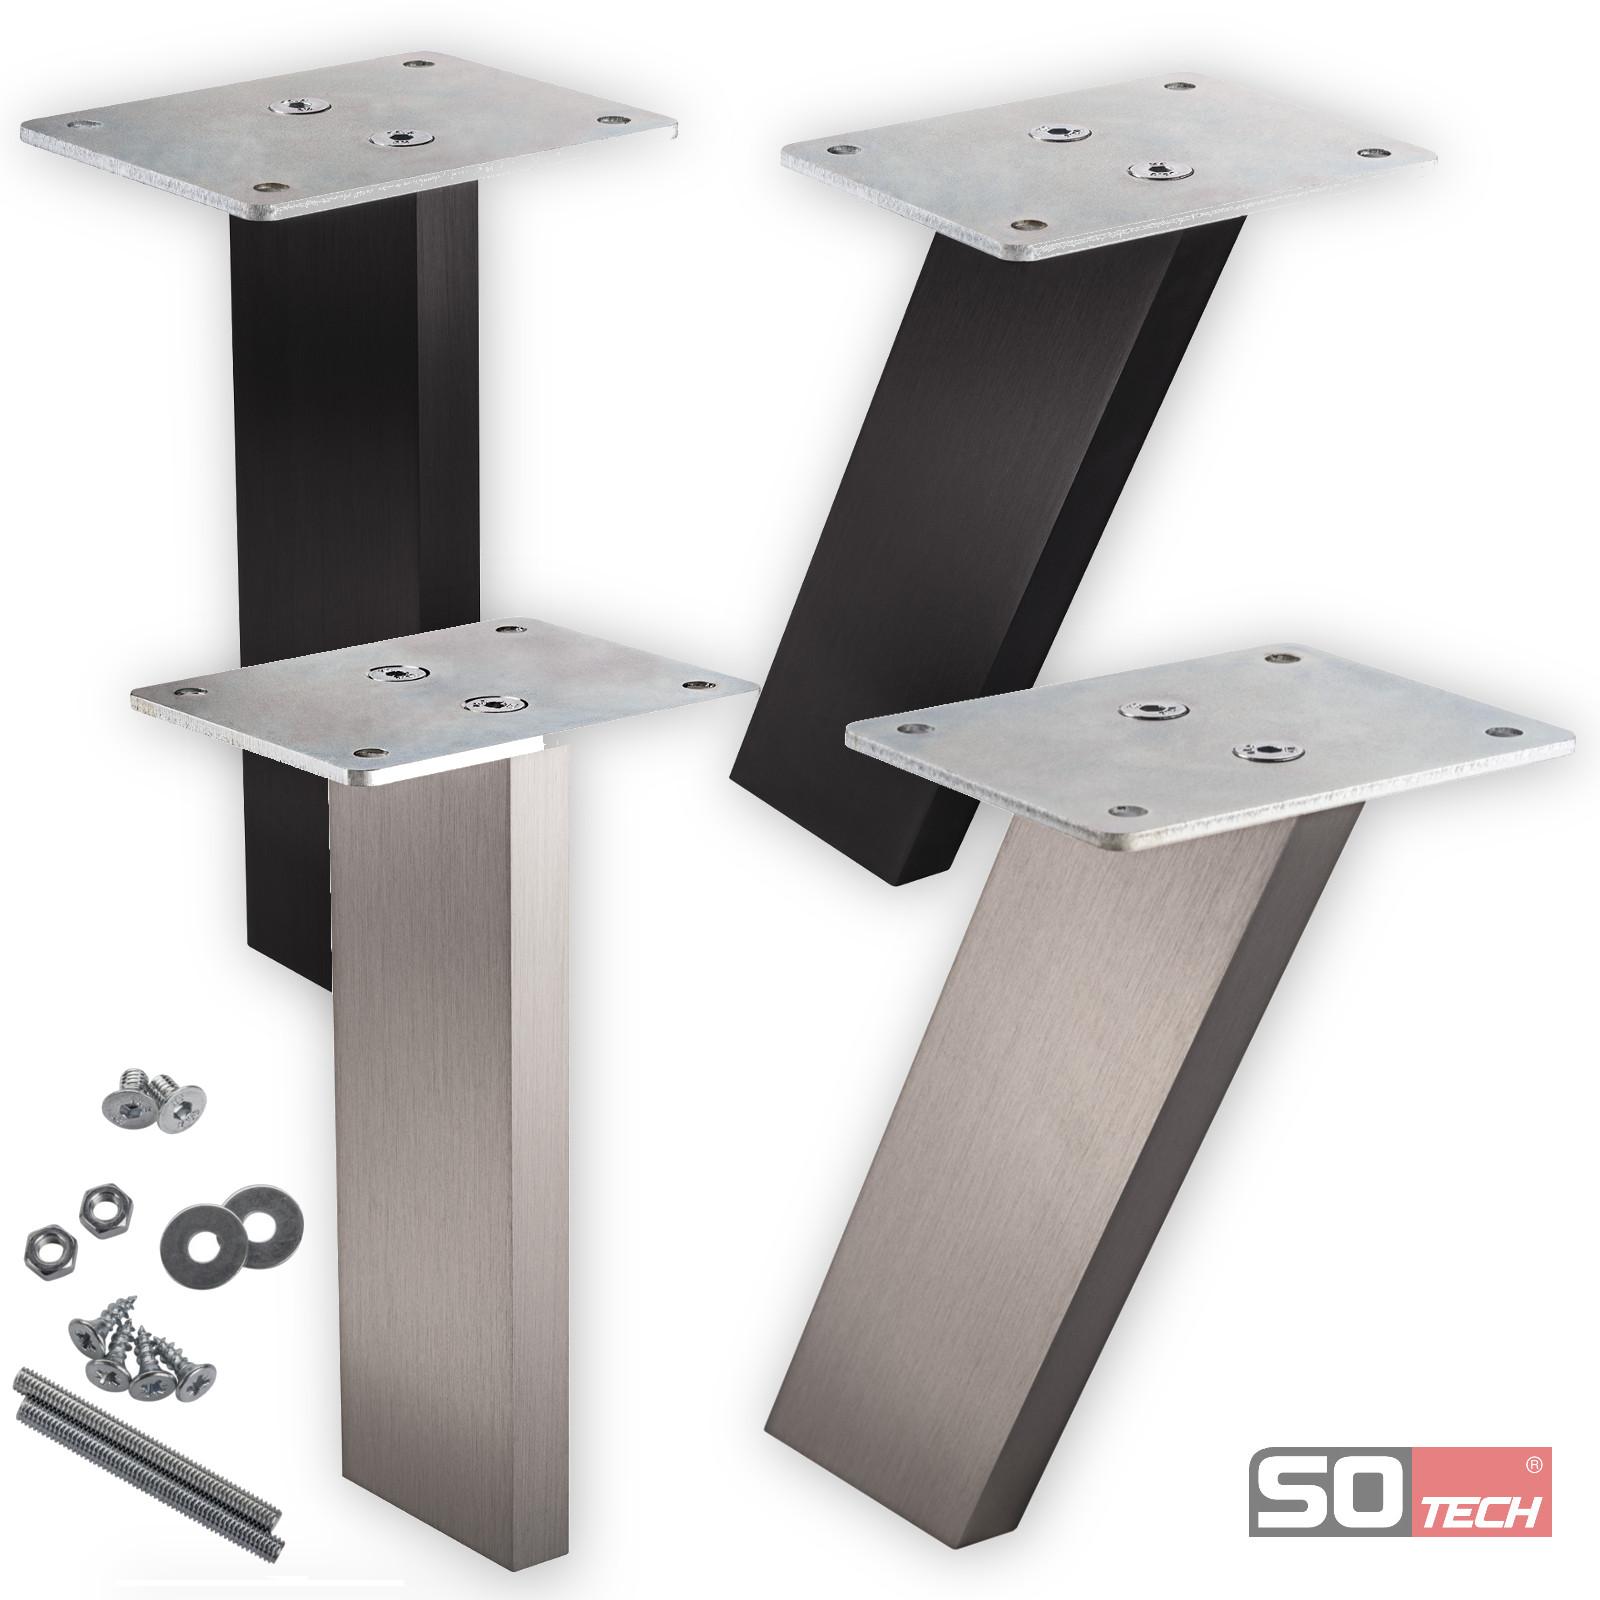 so-tech sotech schüco barkonsole thekenfuß bar-konsole tresenstütze